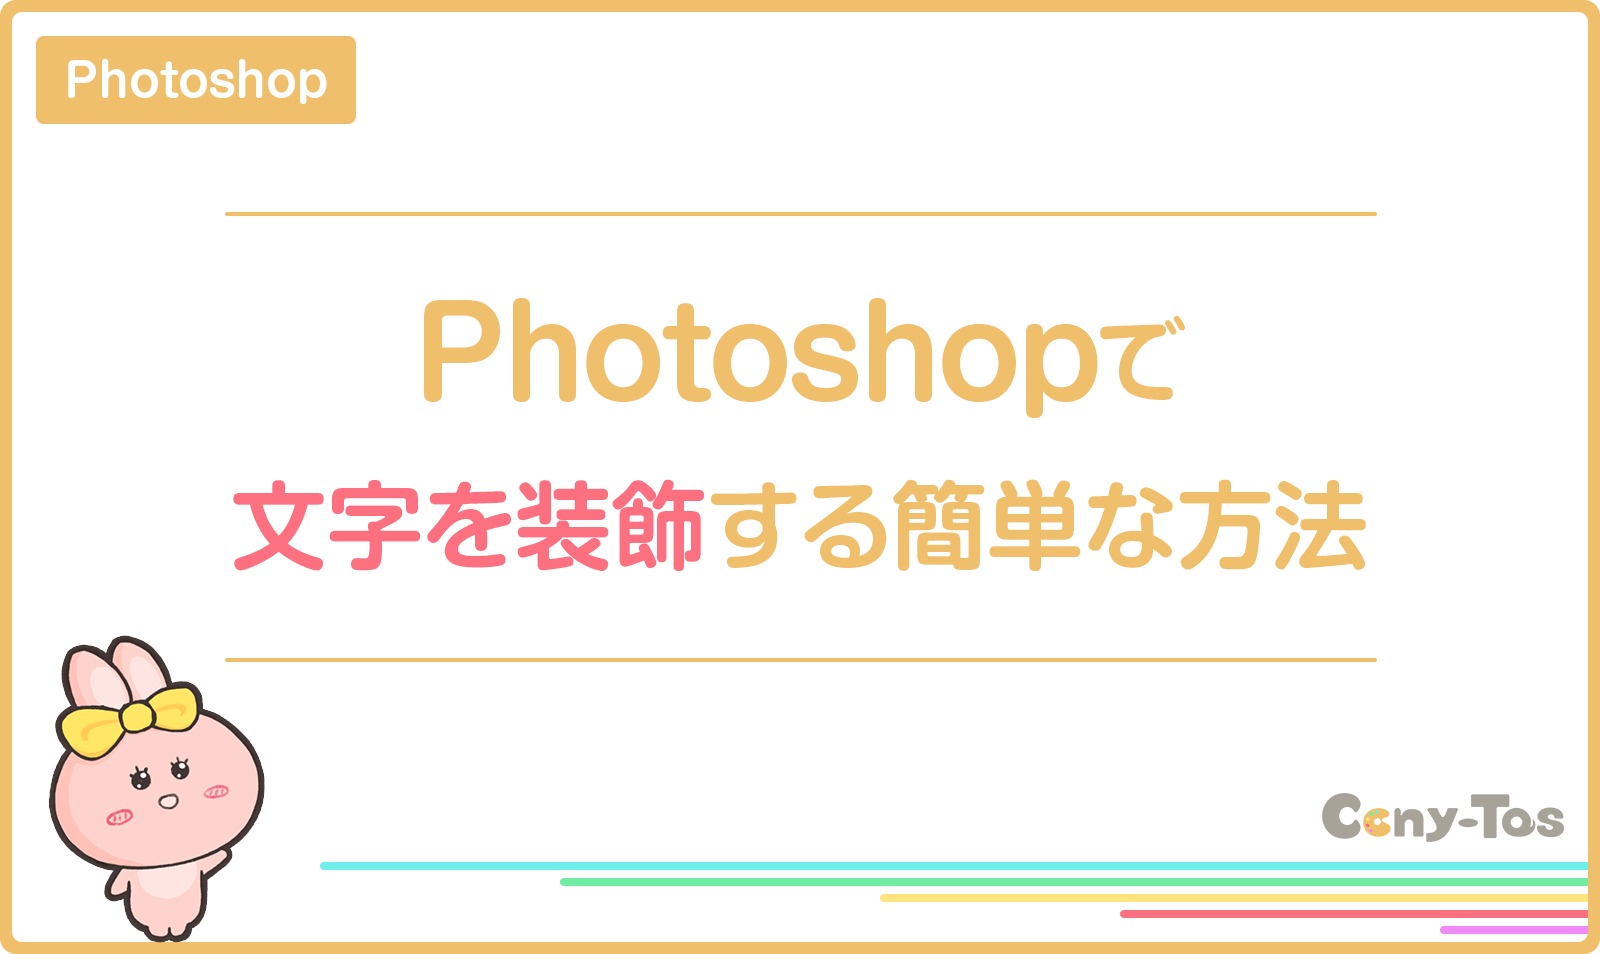 Photoshopで文字を装飾する簡単な方法